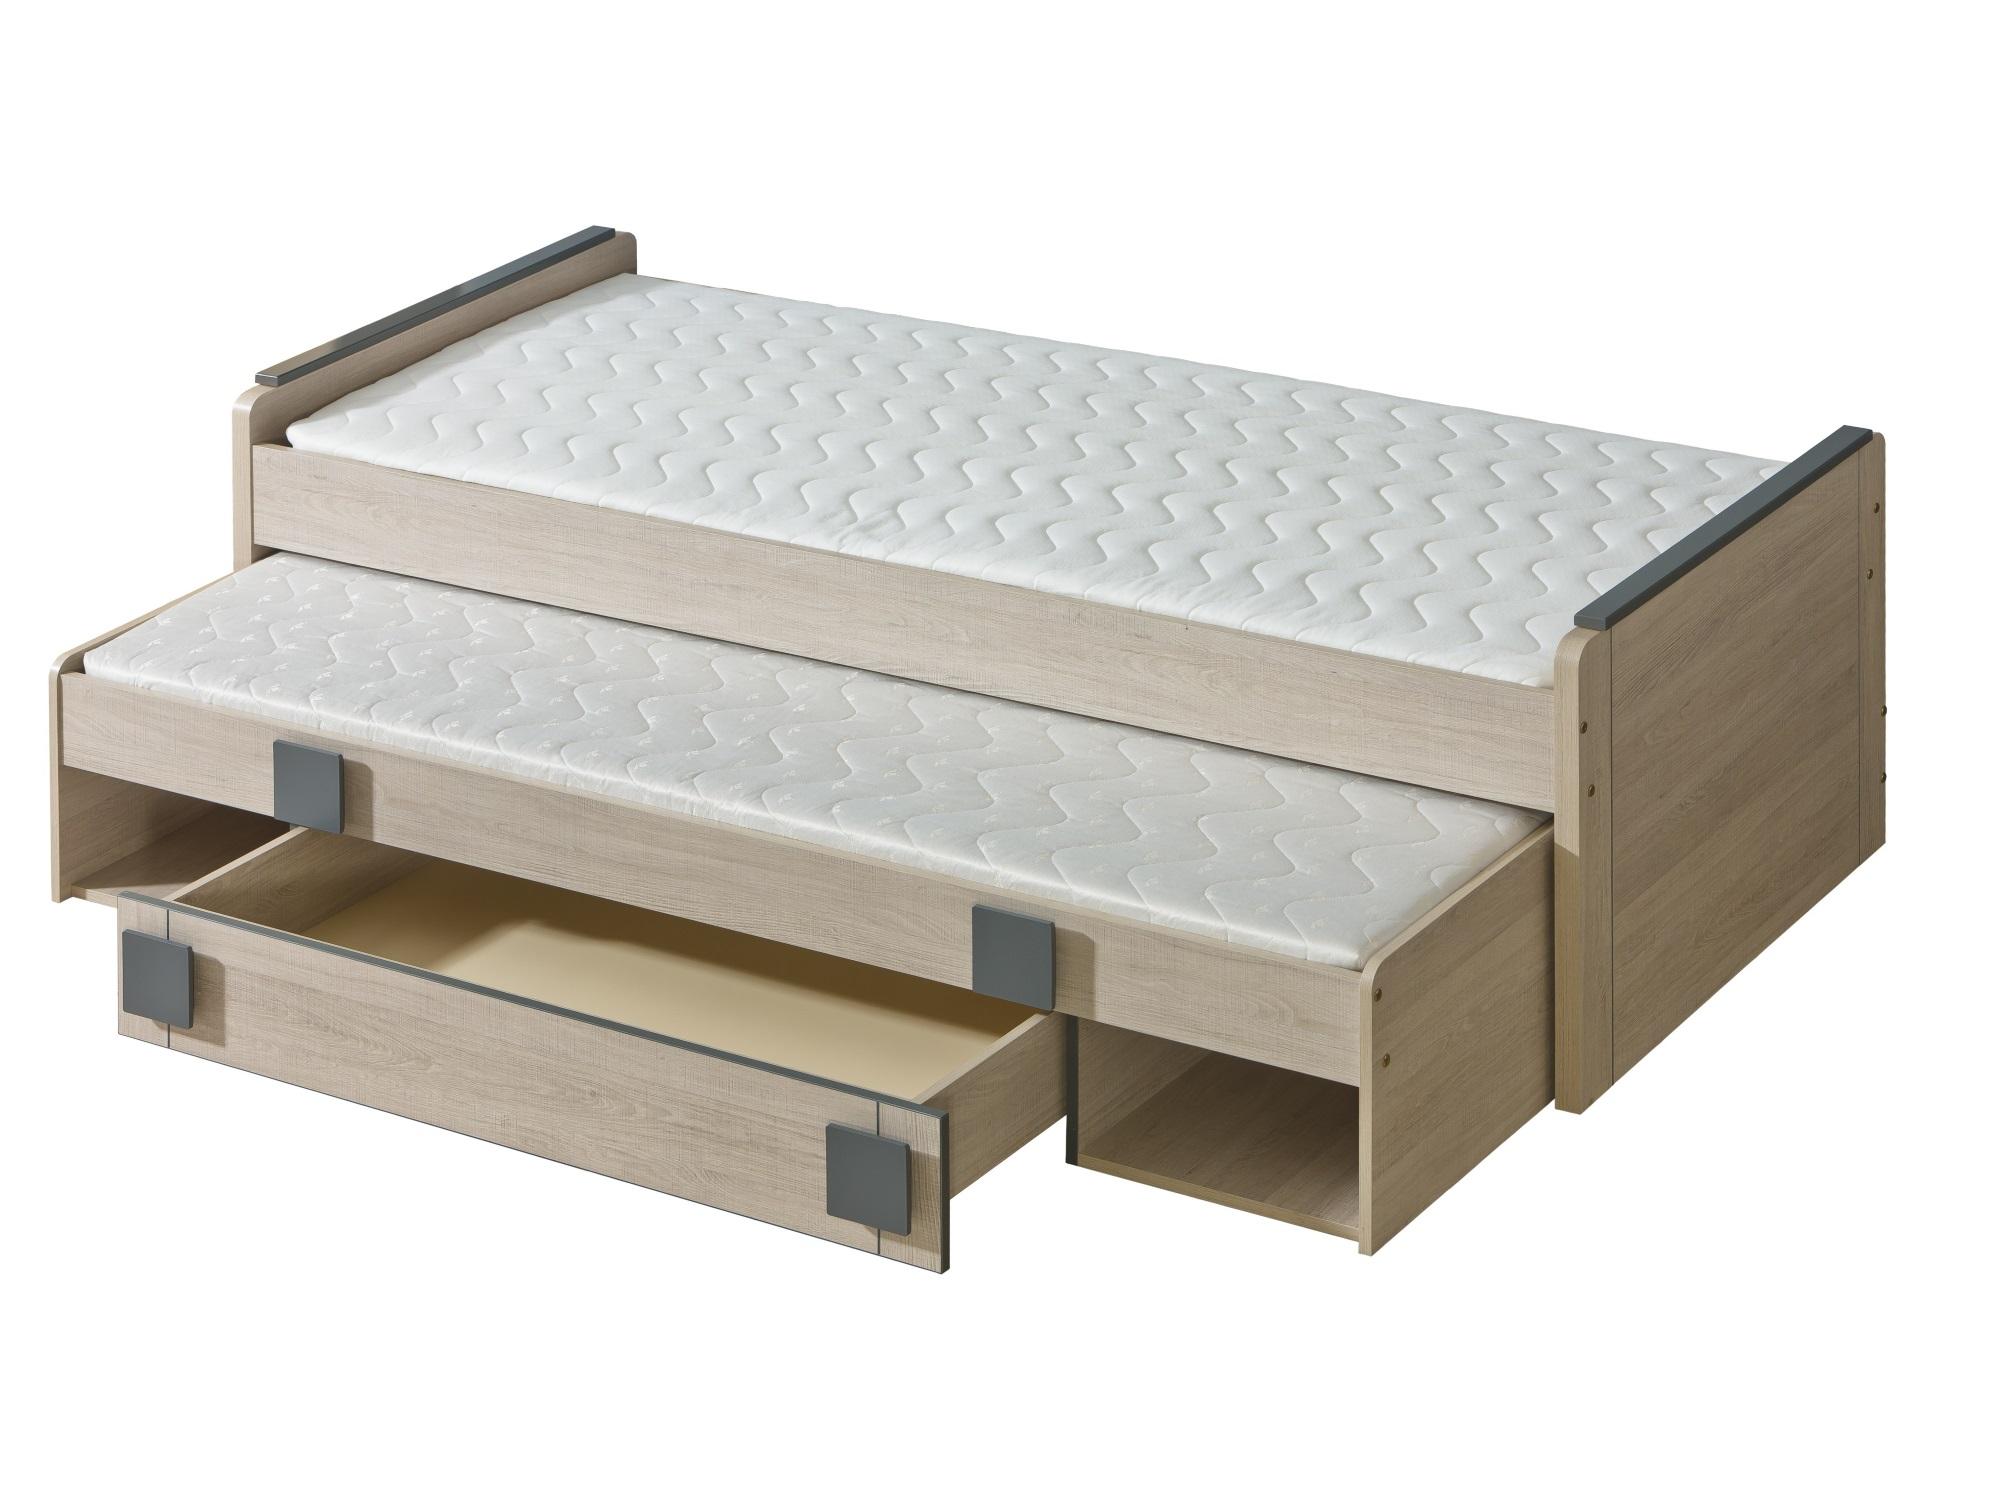 Dolmar Rozkládací postel Gumi G16